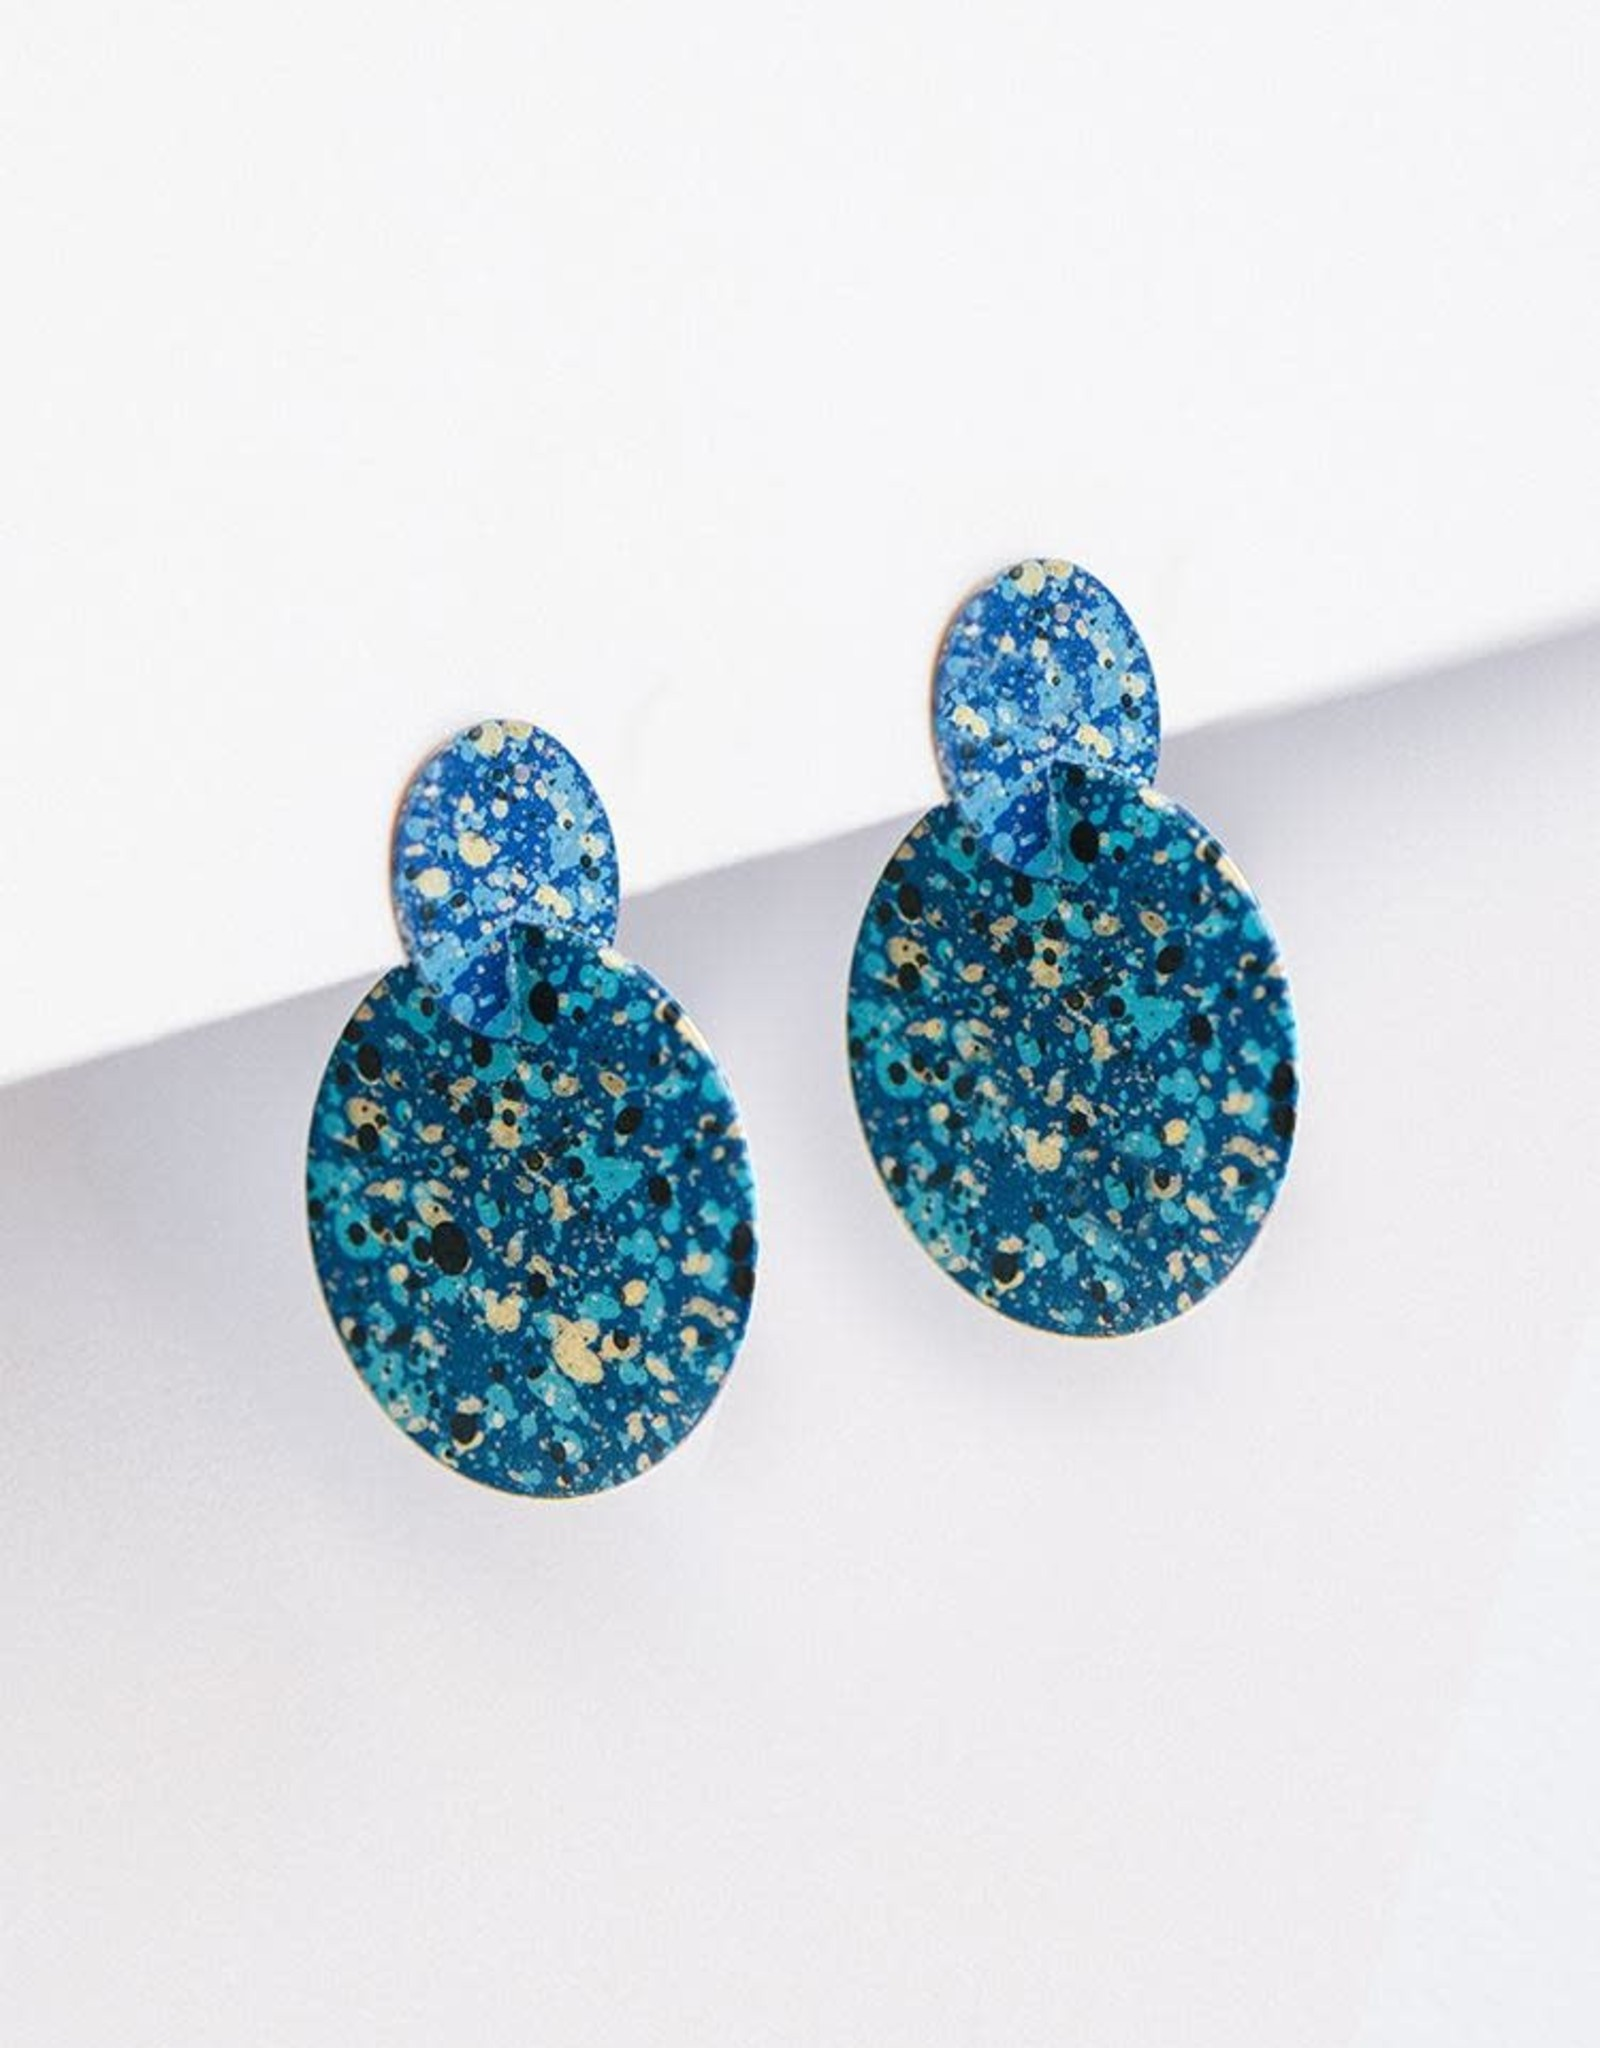 Mata Traders Interstellar Stud Earring, Blue Painted Metal - Mata Traders